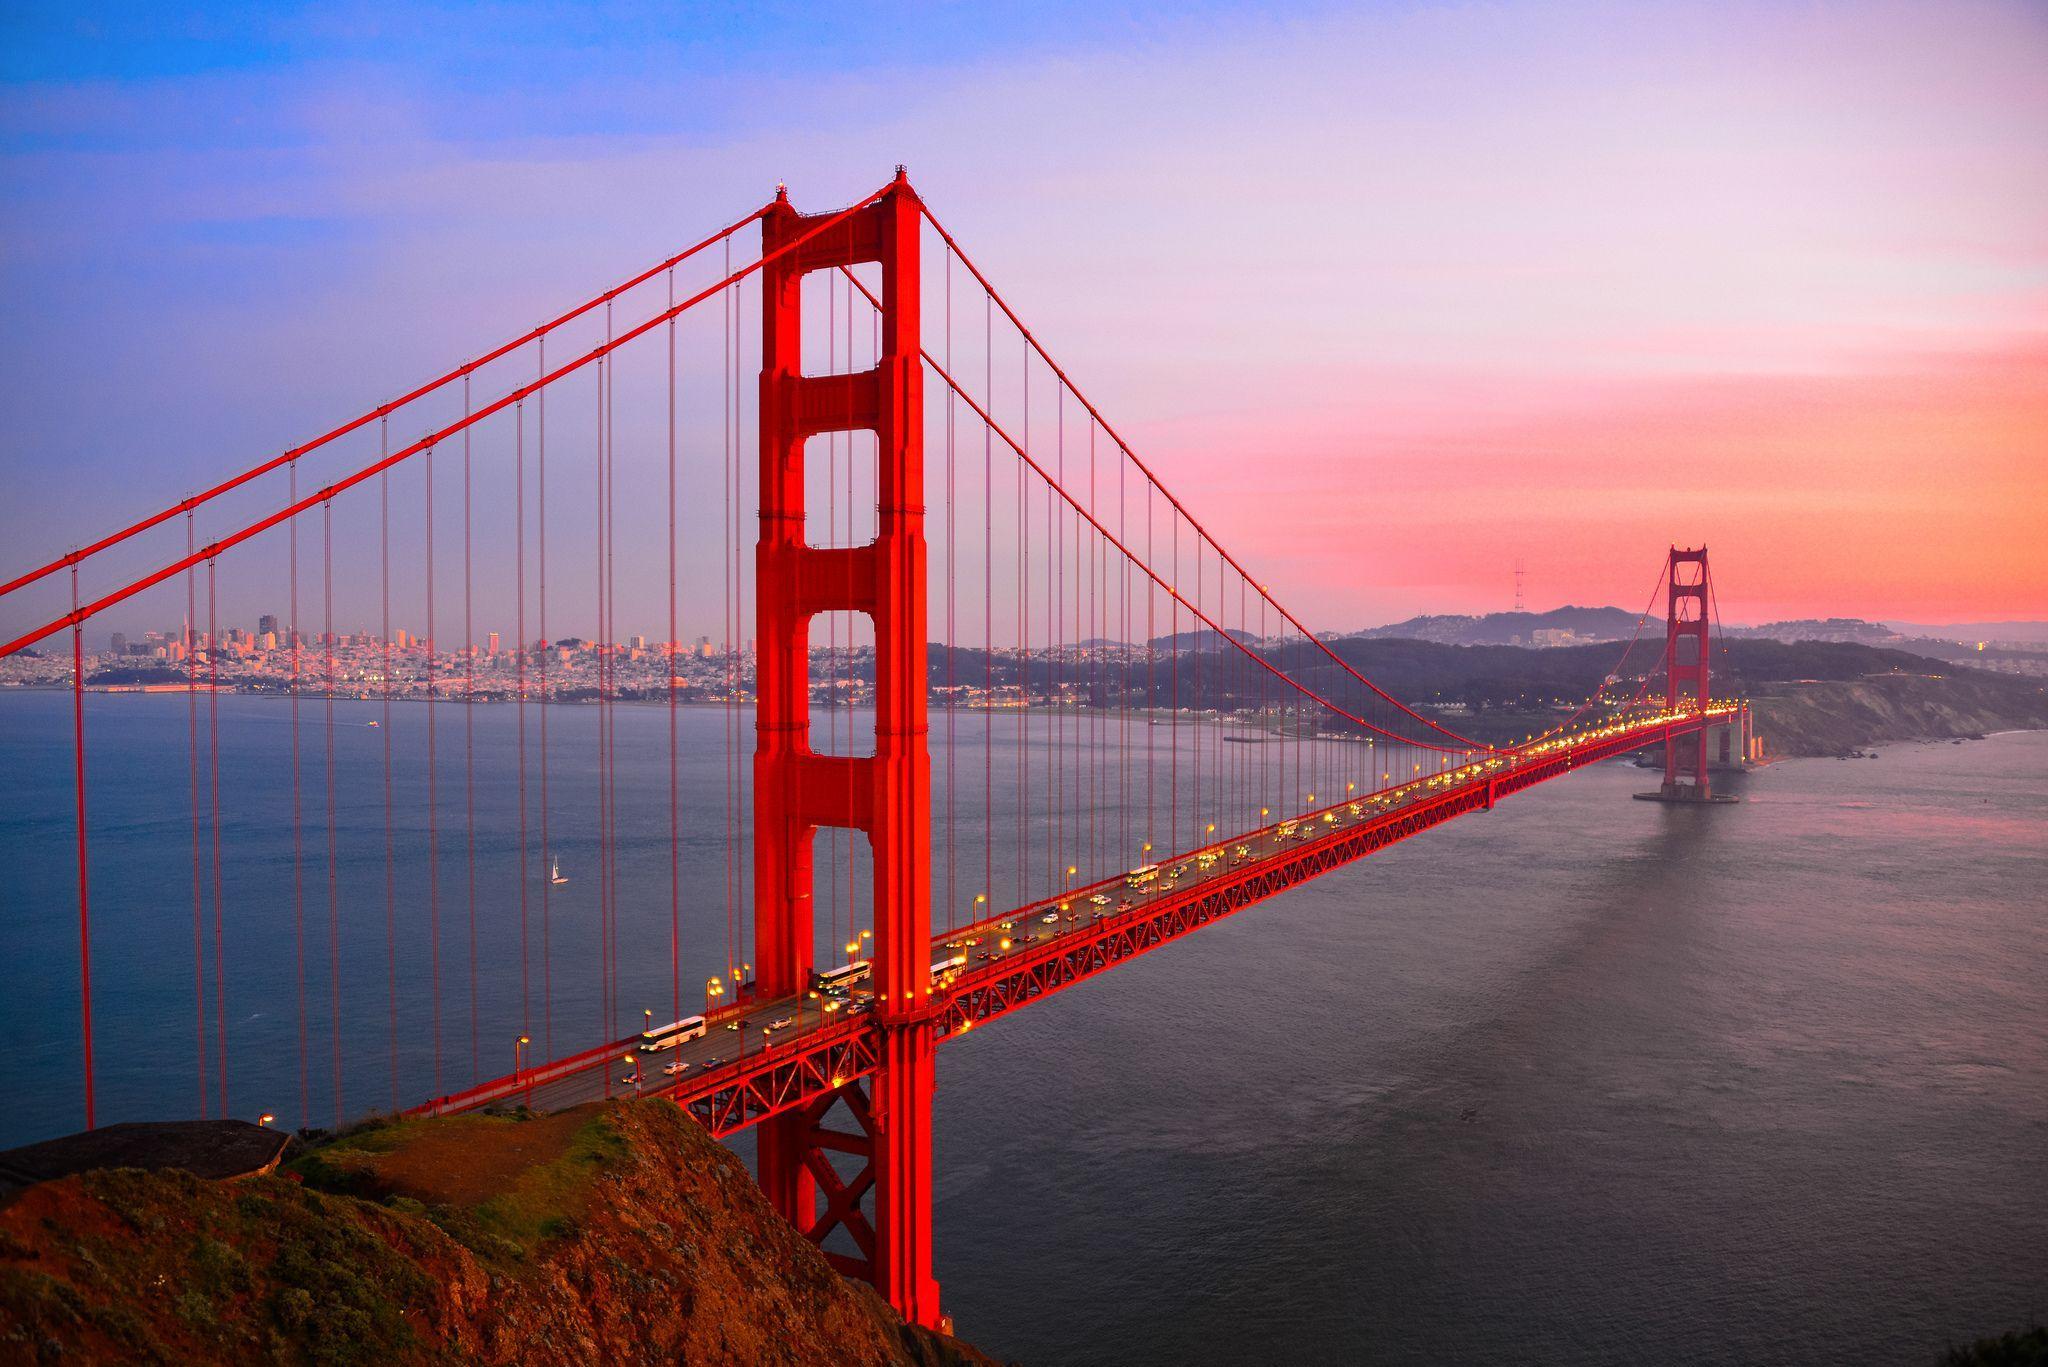 Golden Gate Bridge Wallpapers Top Free Golden Gate Bridge